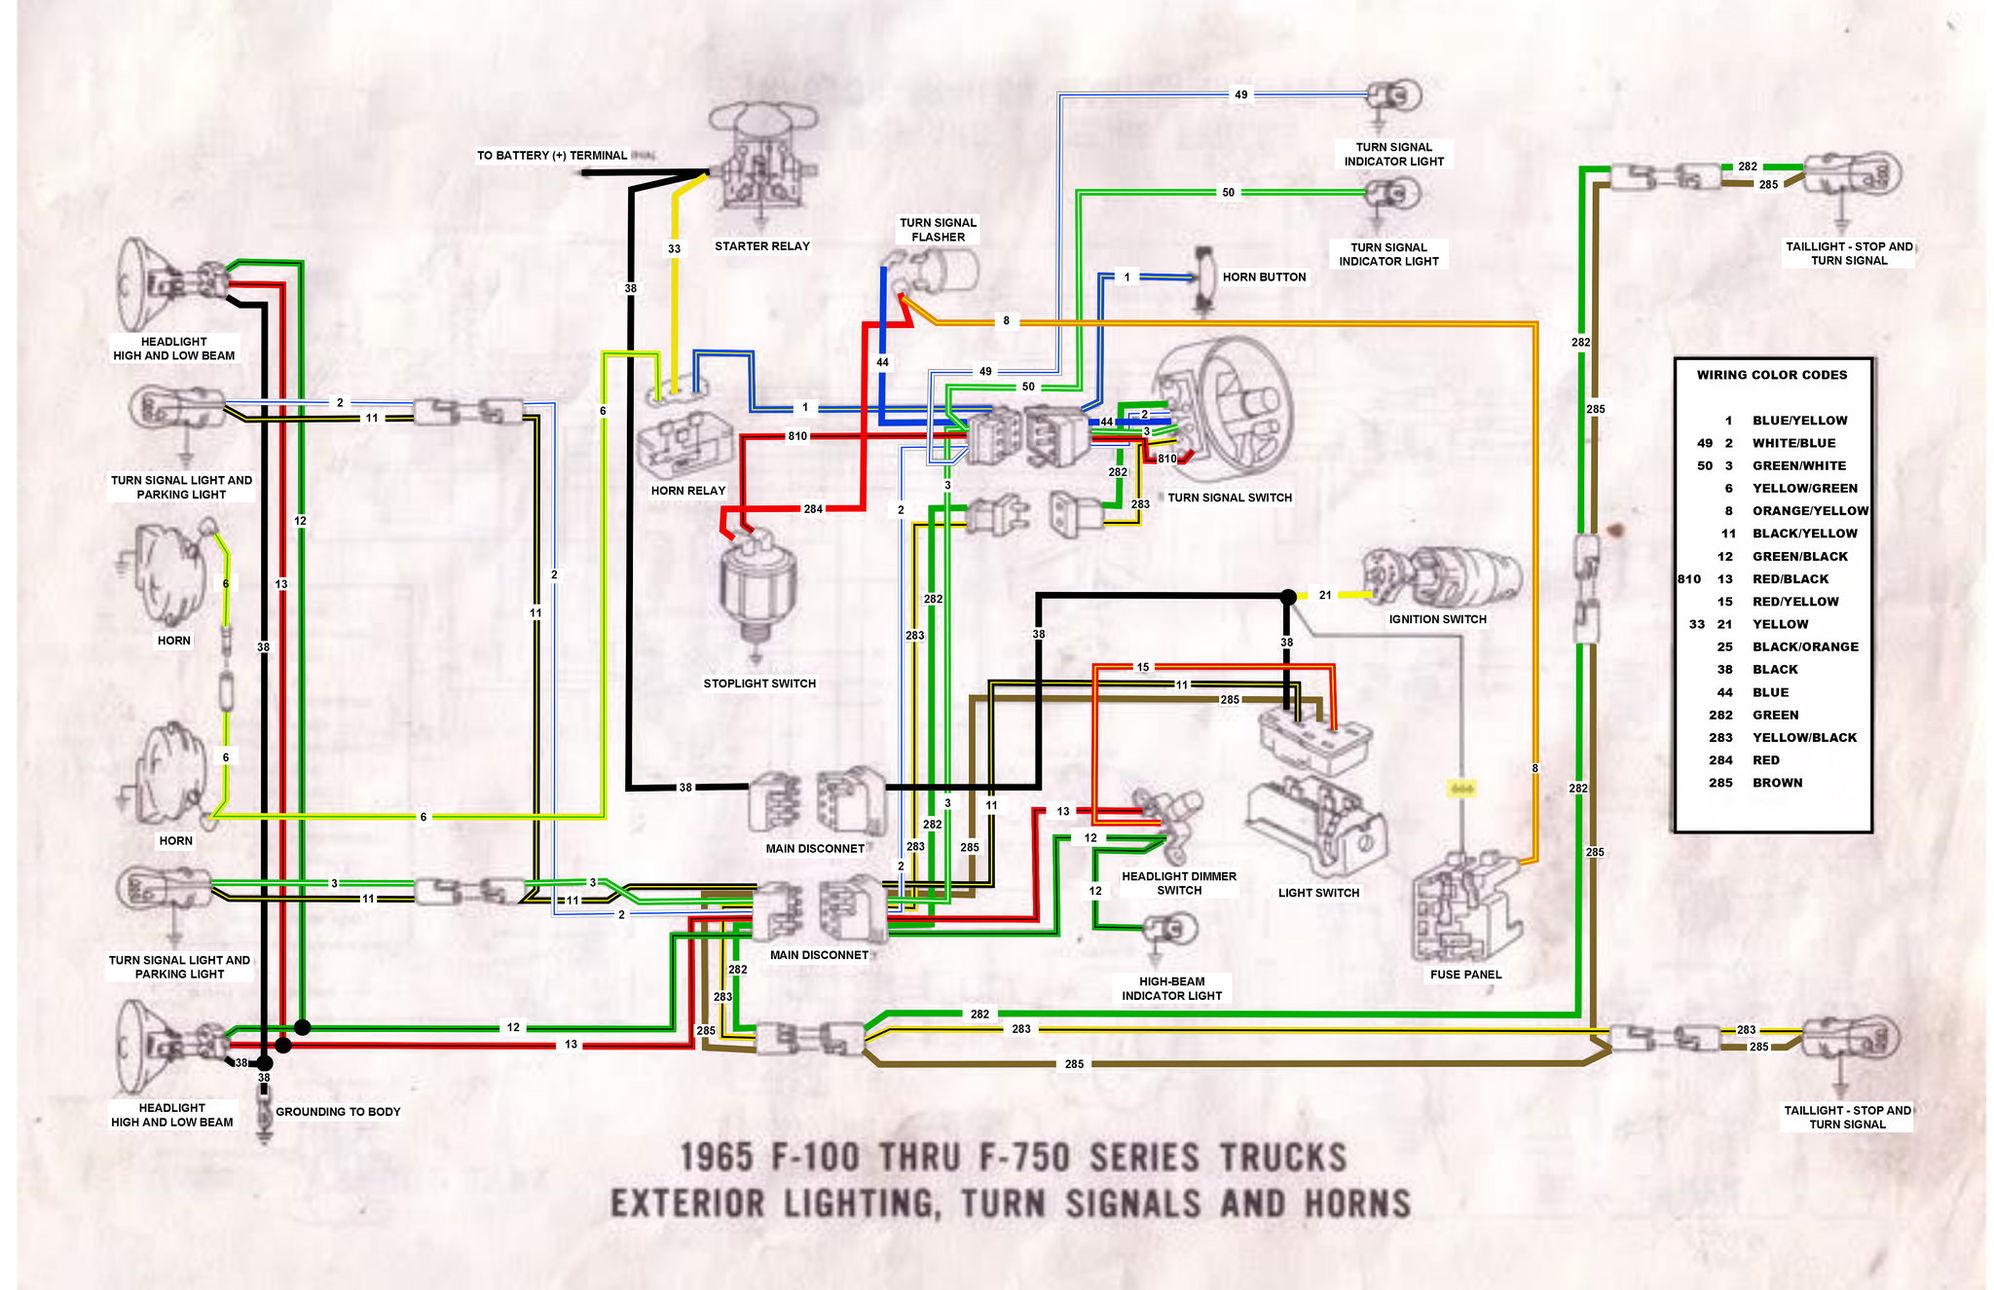 Bodine Ballast Wiring Diagram Lp 400 10100 Emergency